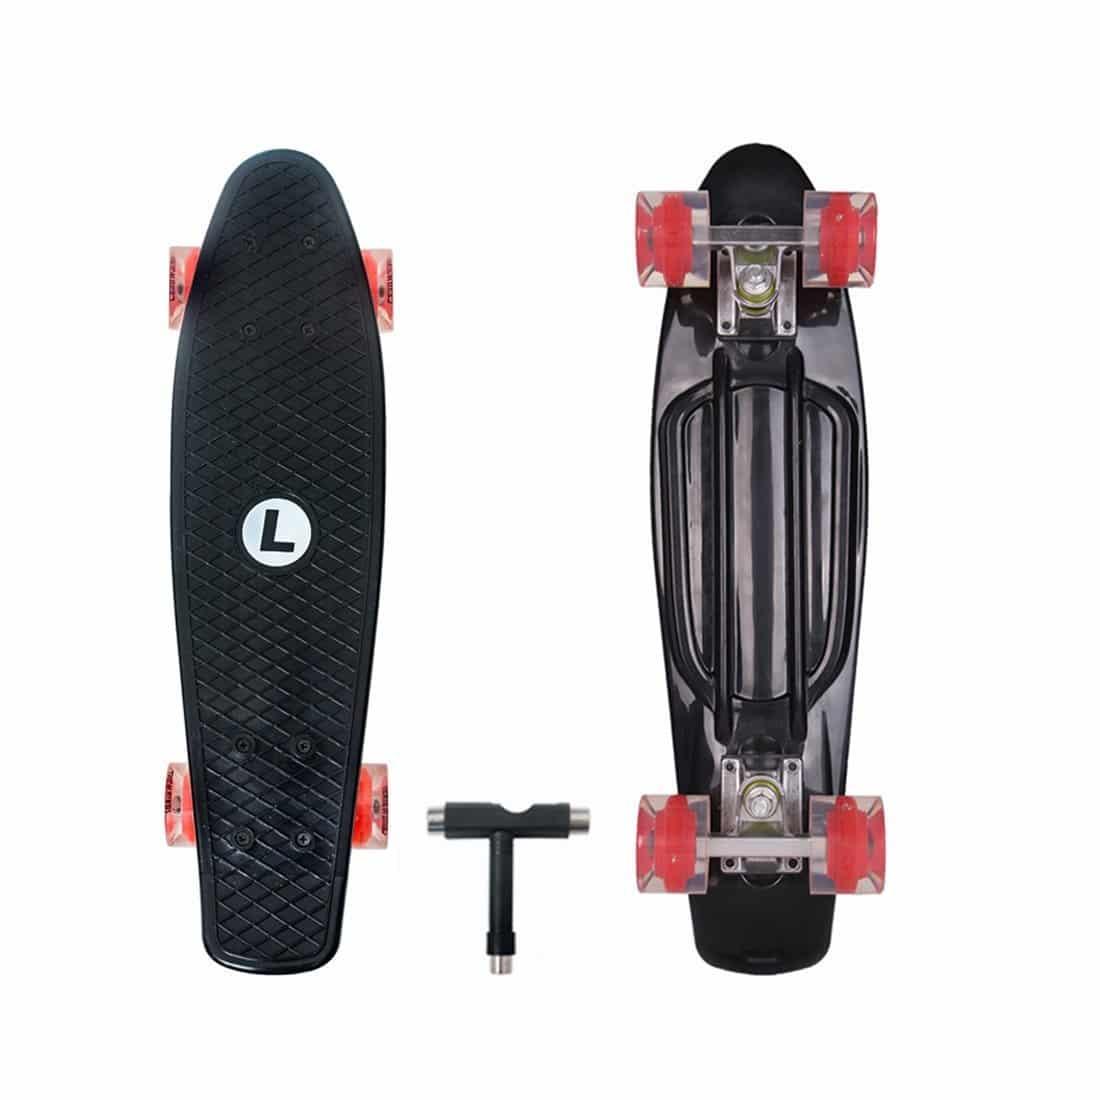 Landwalker 22″ Light Up Skateboard Review